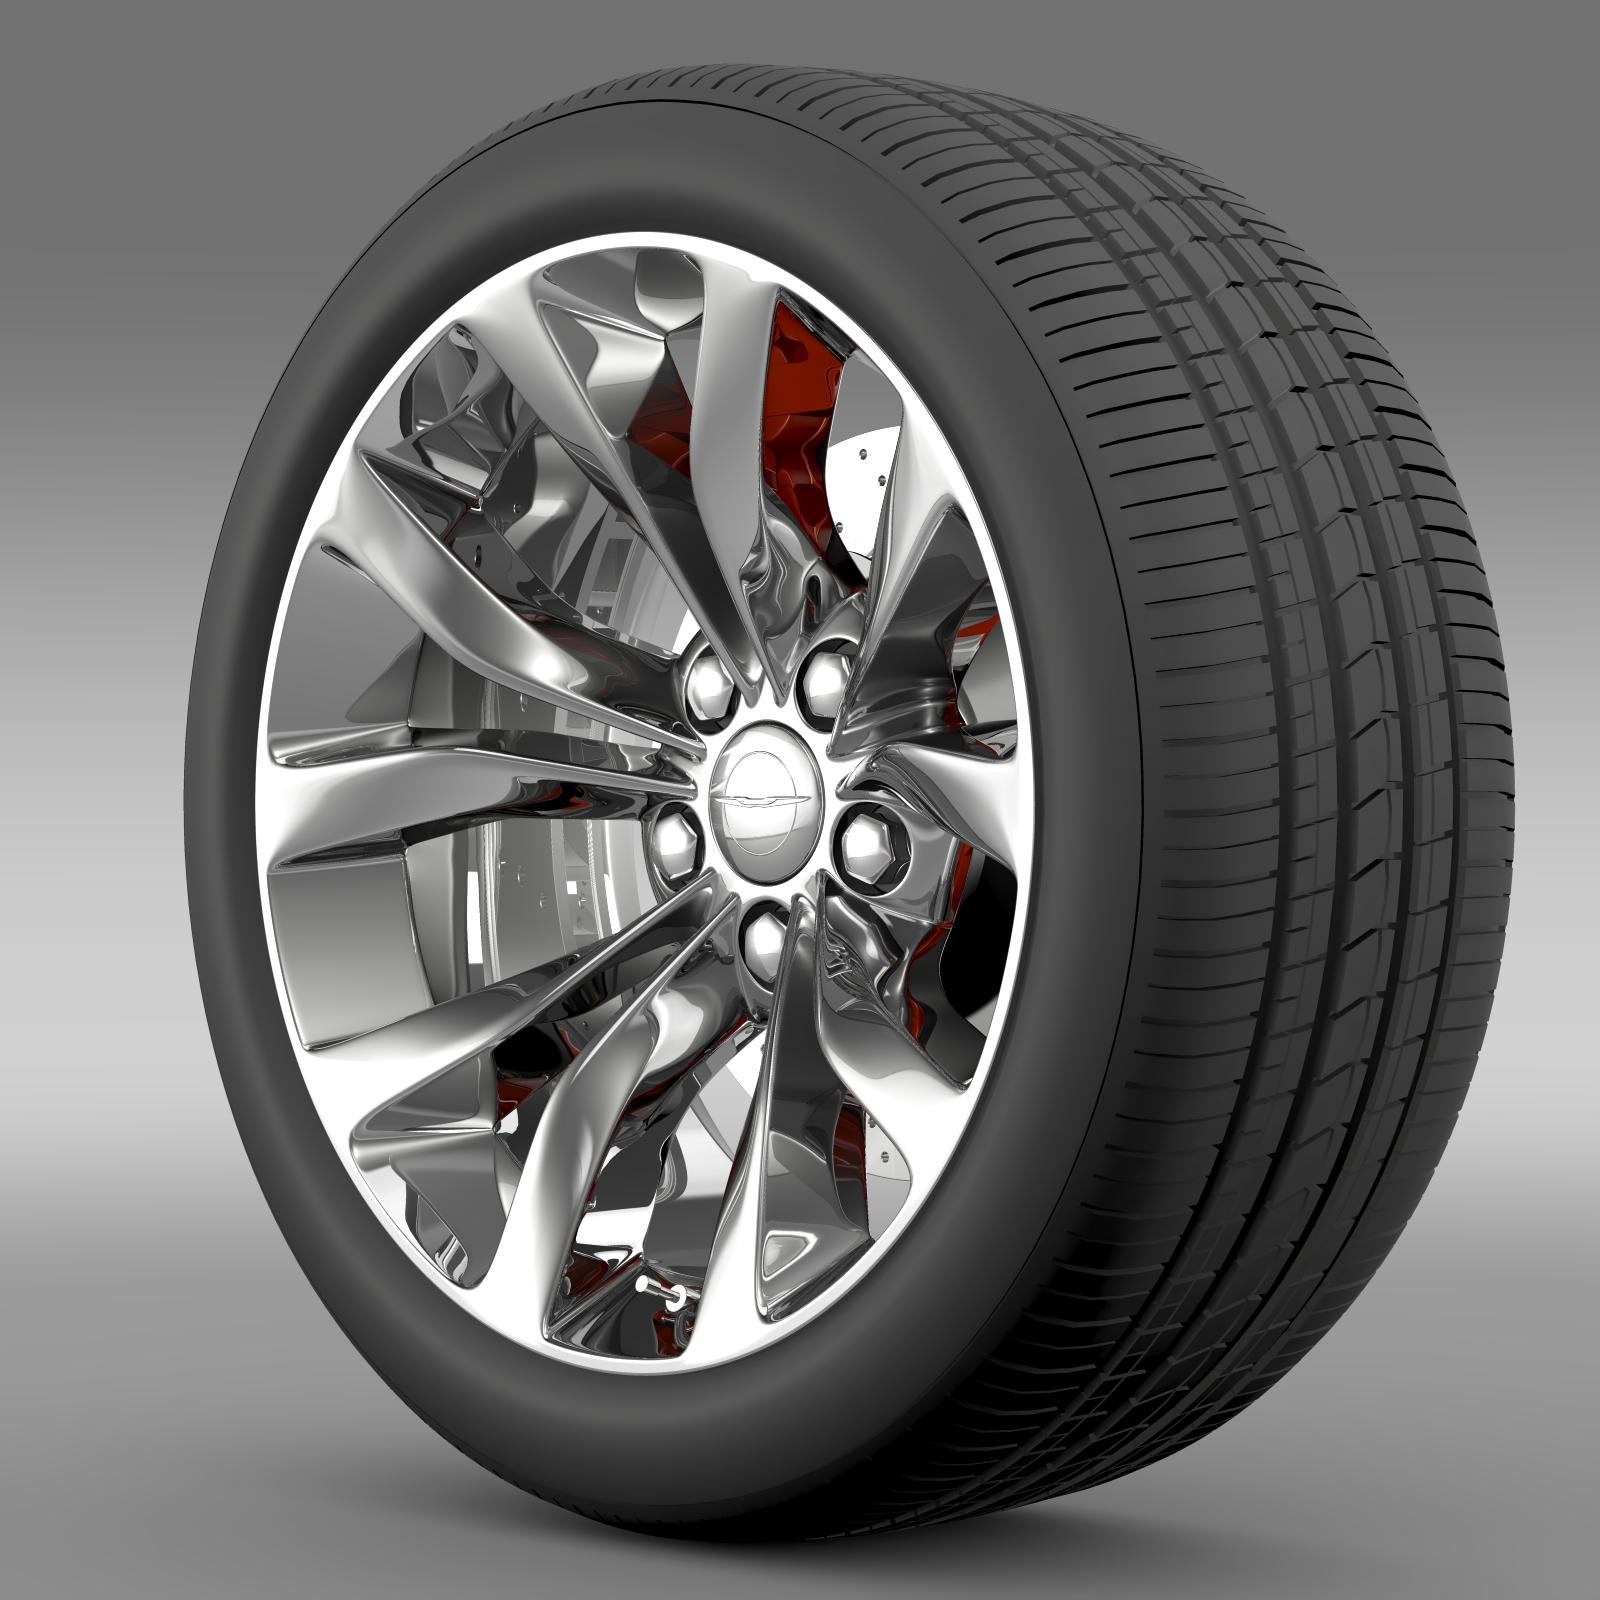 Chrysler 300 Limited 2015 wheel 3d model 3ds max fbx c4d lwo lws lw ma mb  obj 212744